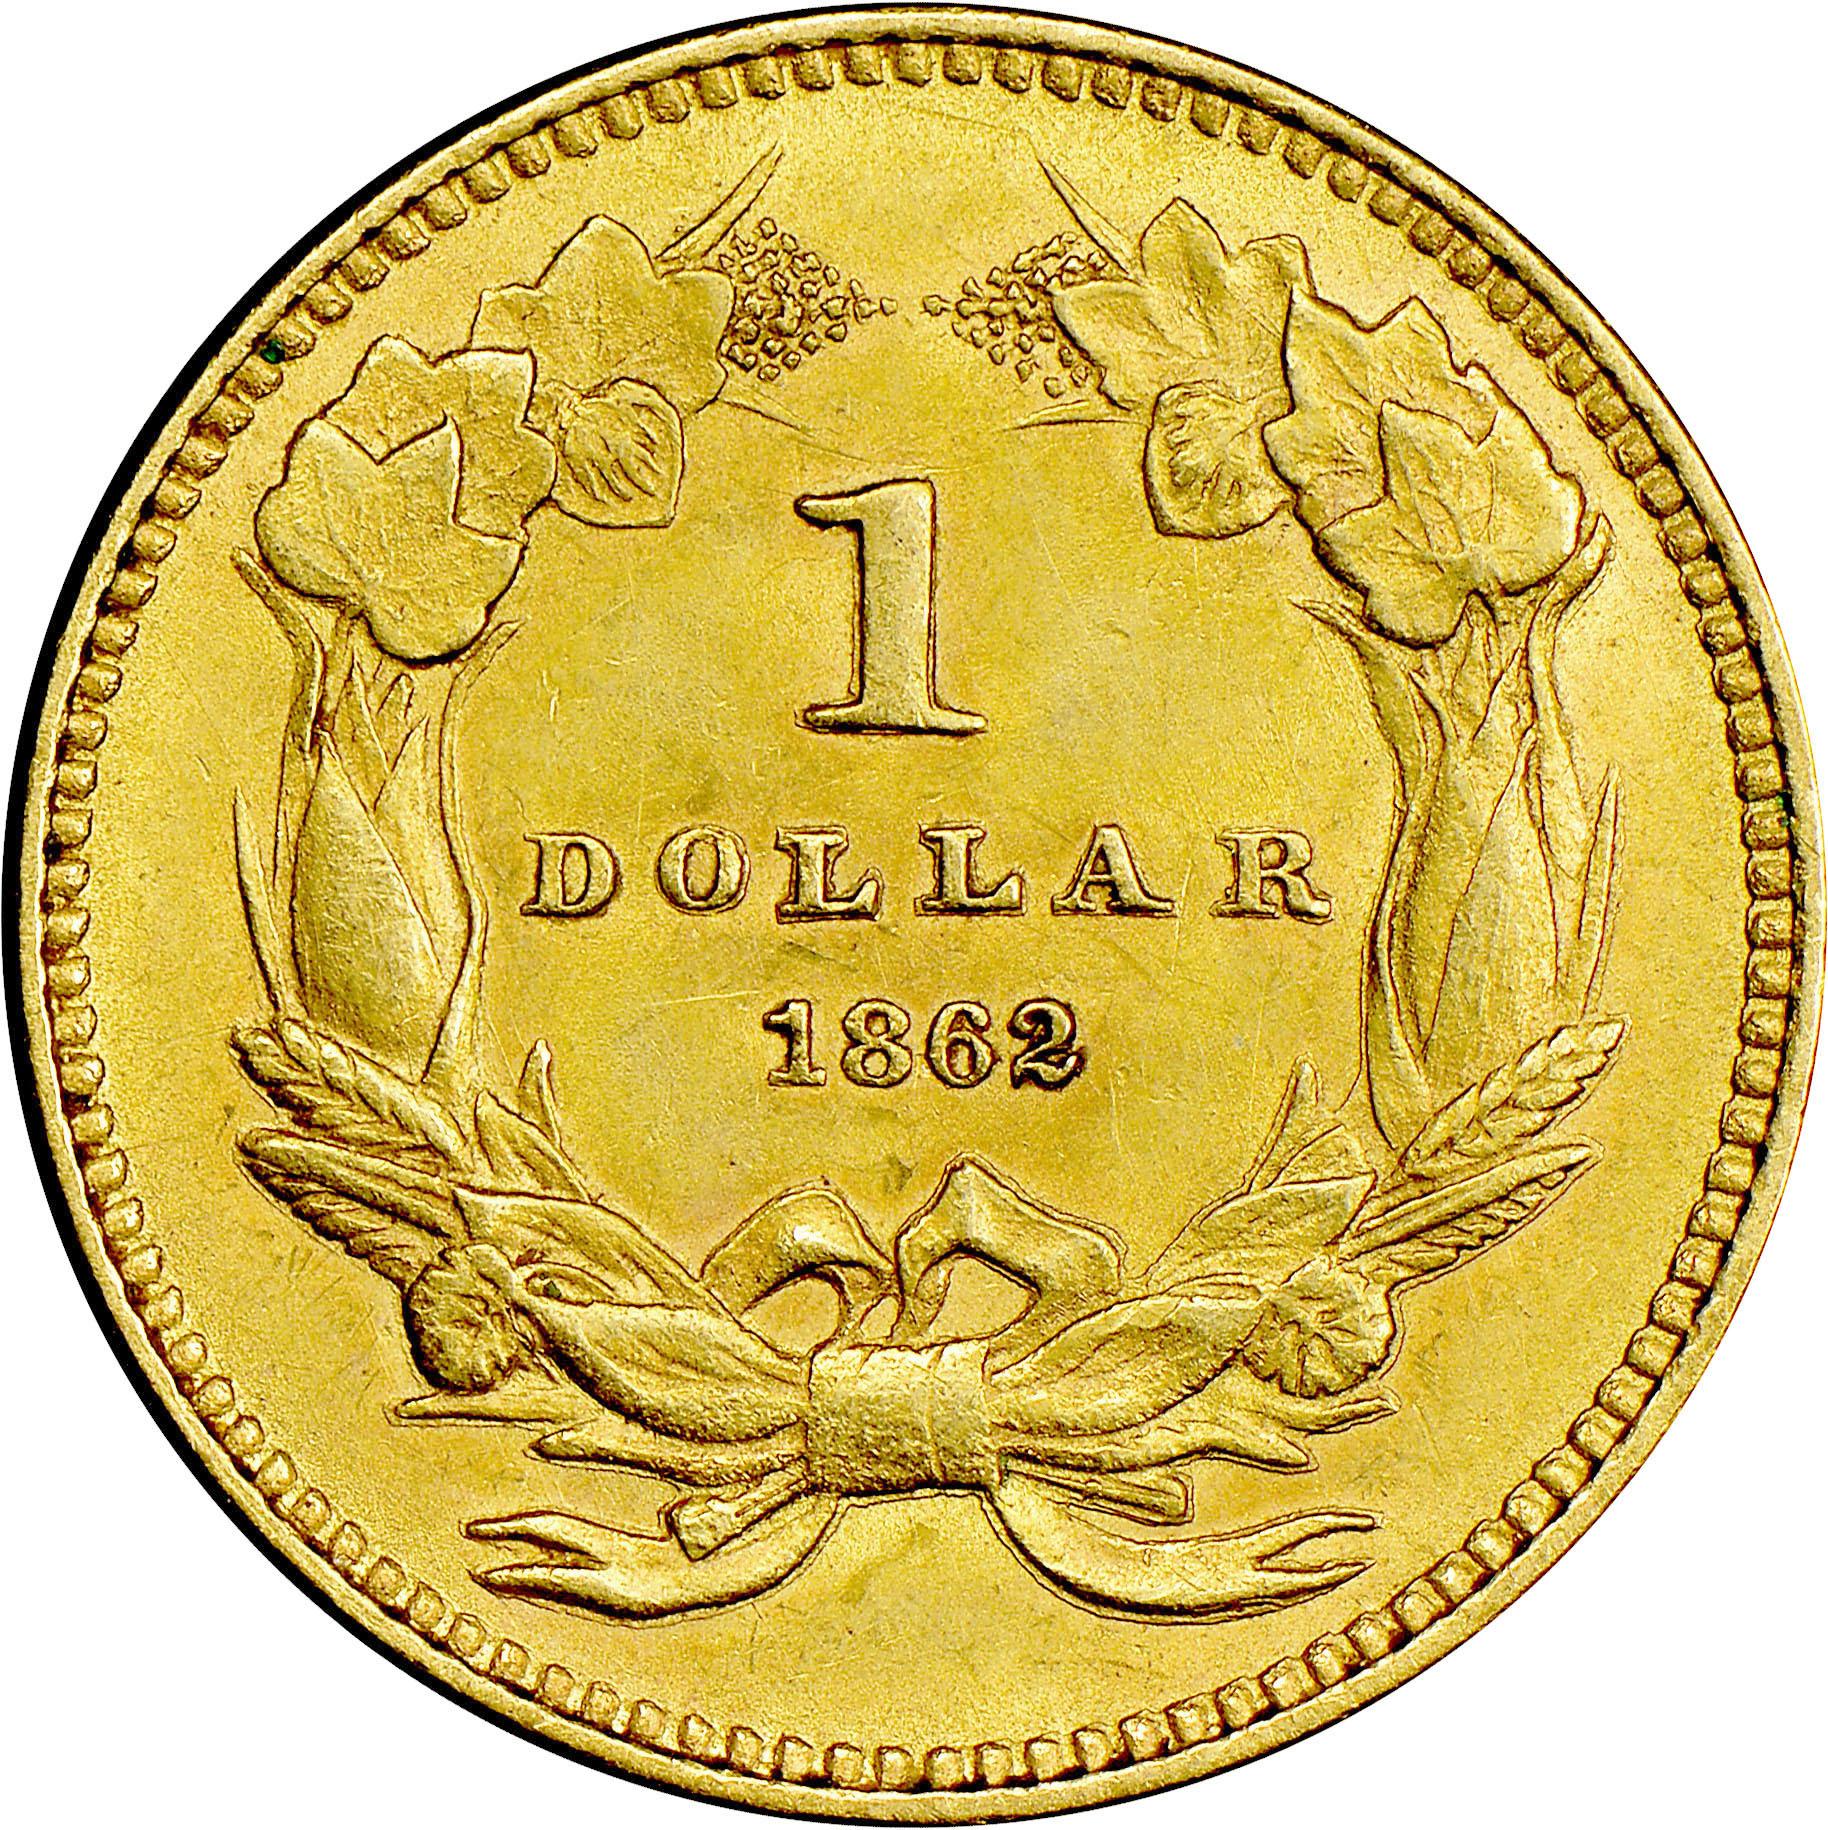 1862 G 1 Ms Gold Dollars Ngc